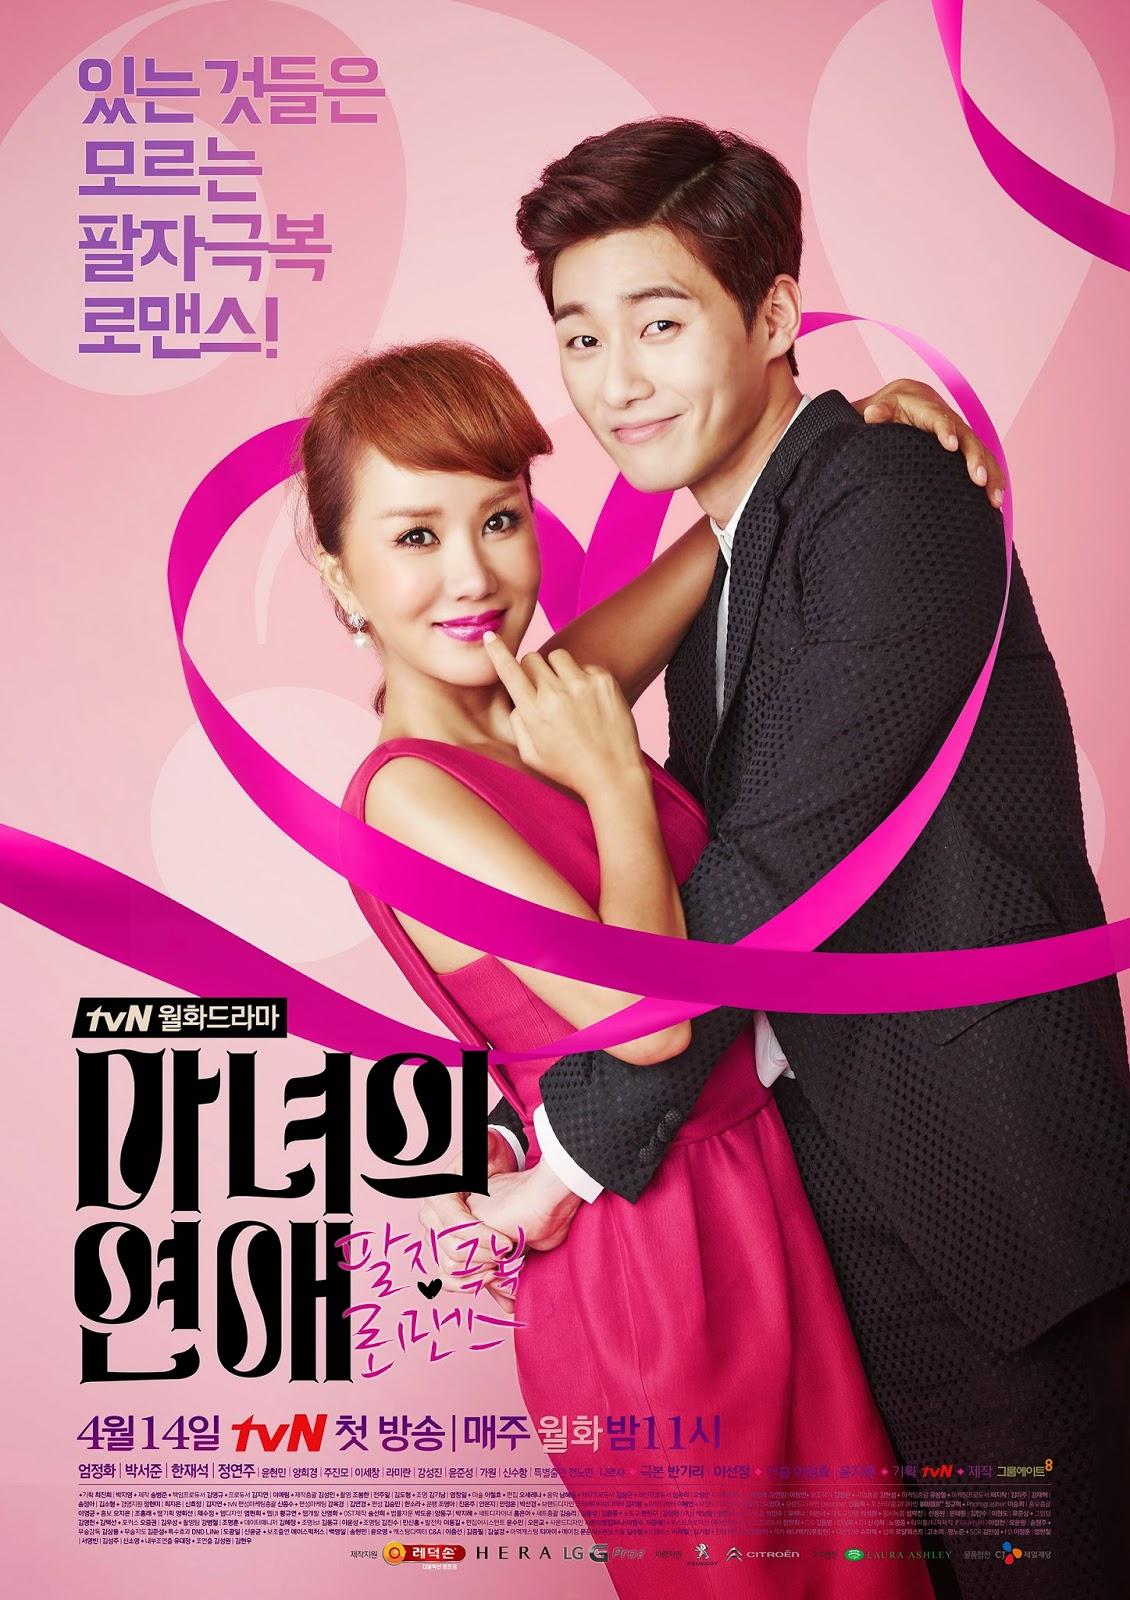 Park Seo Joon Kdrama Witch's Romance Poster 2